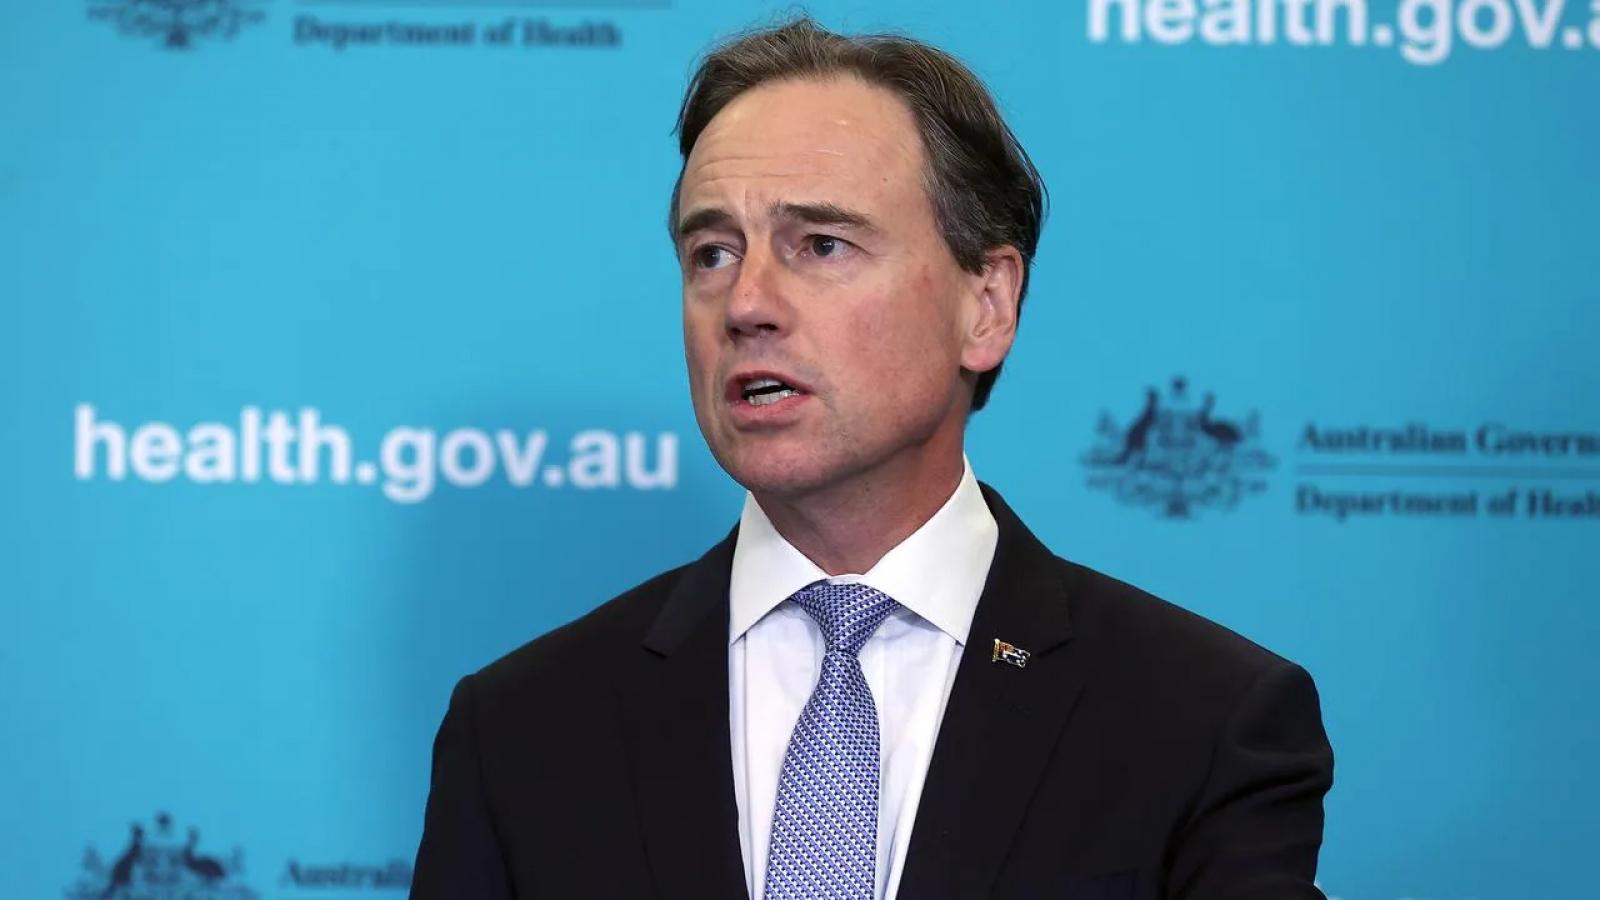 Australia sẽ tiêm vaccine Pfizer cho trẻ em yếm thế từ 12-15 tuổi